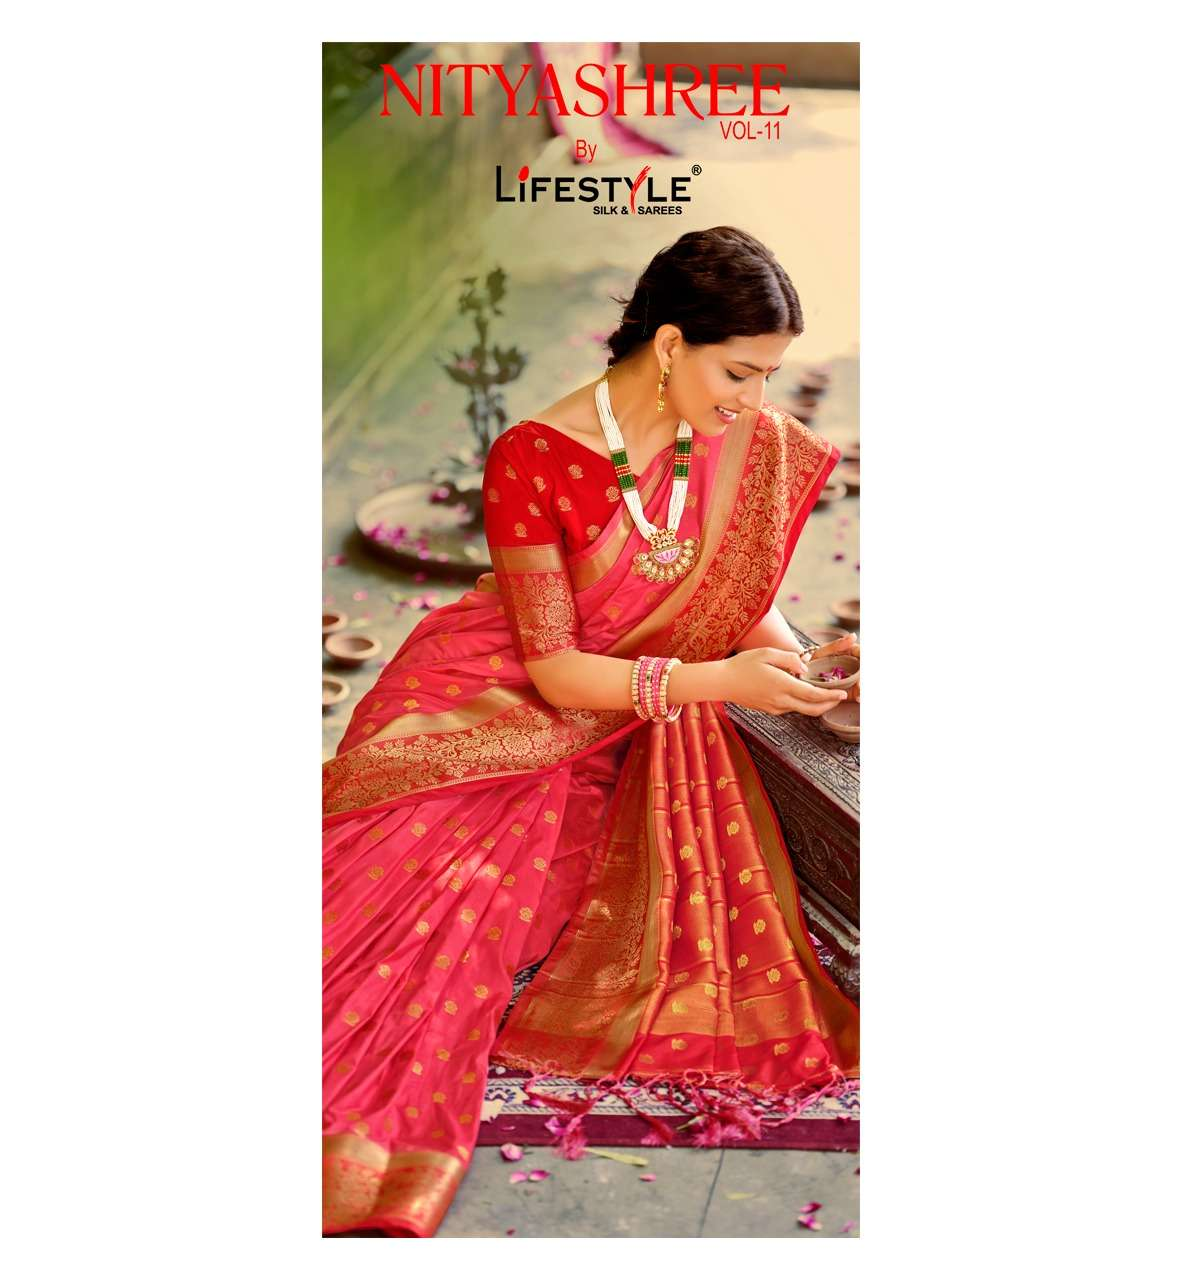 nityashree vol 11 by lifestyle nylon raw silk exclusive saree range